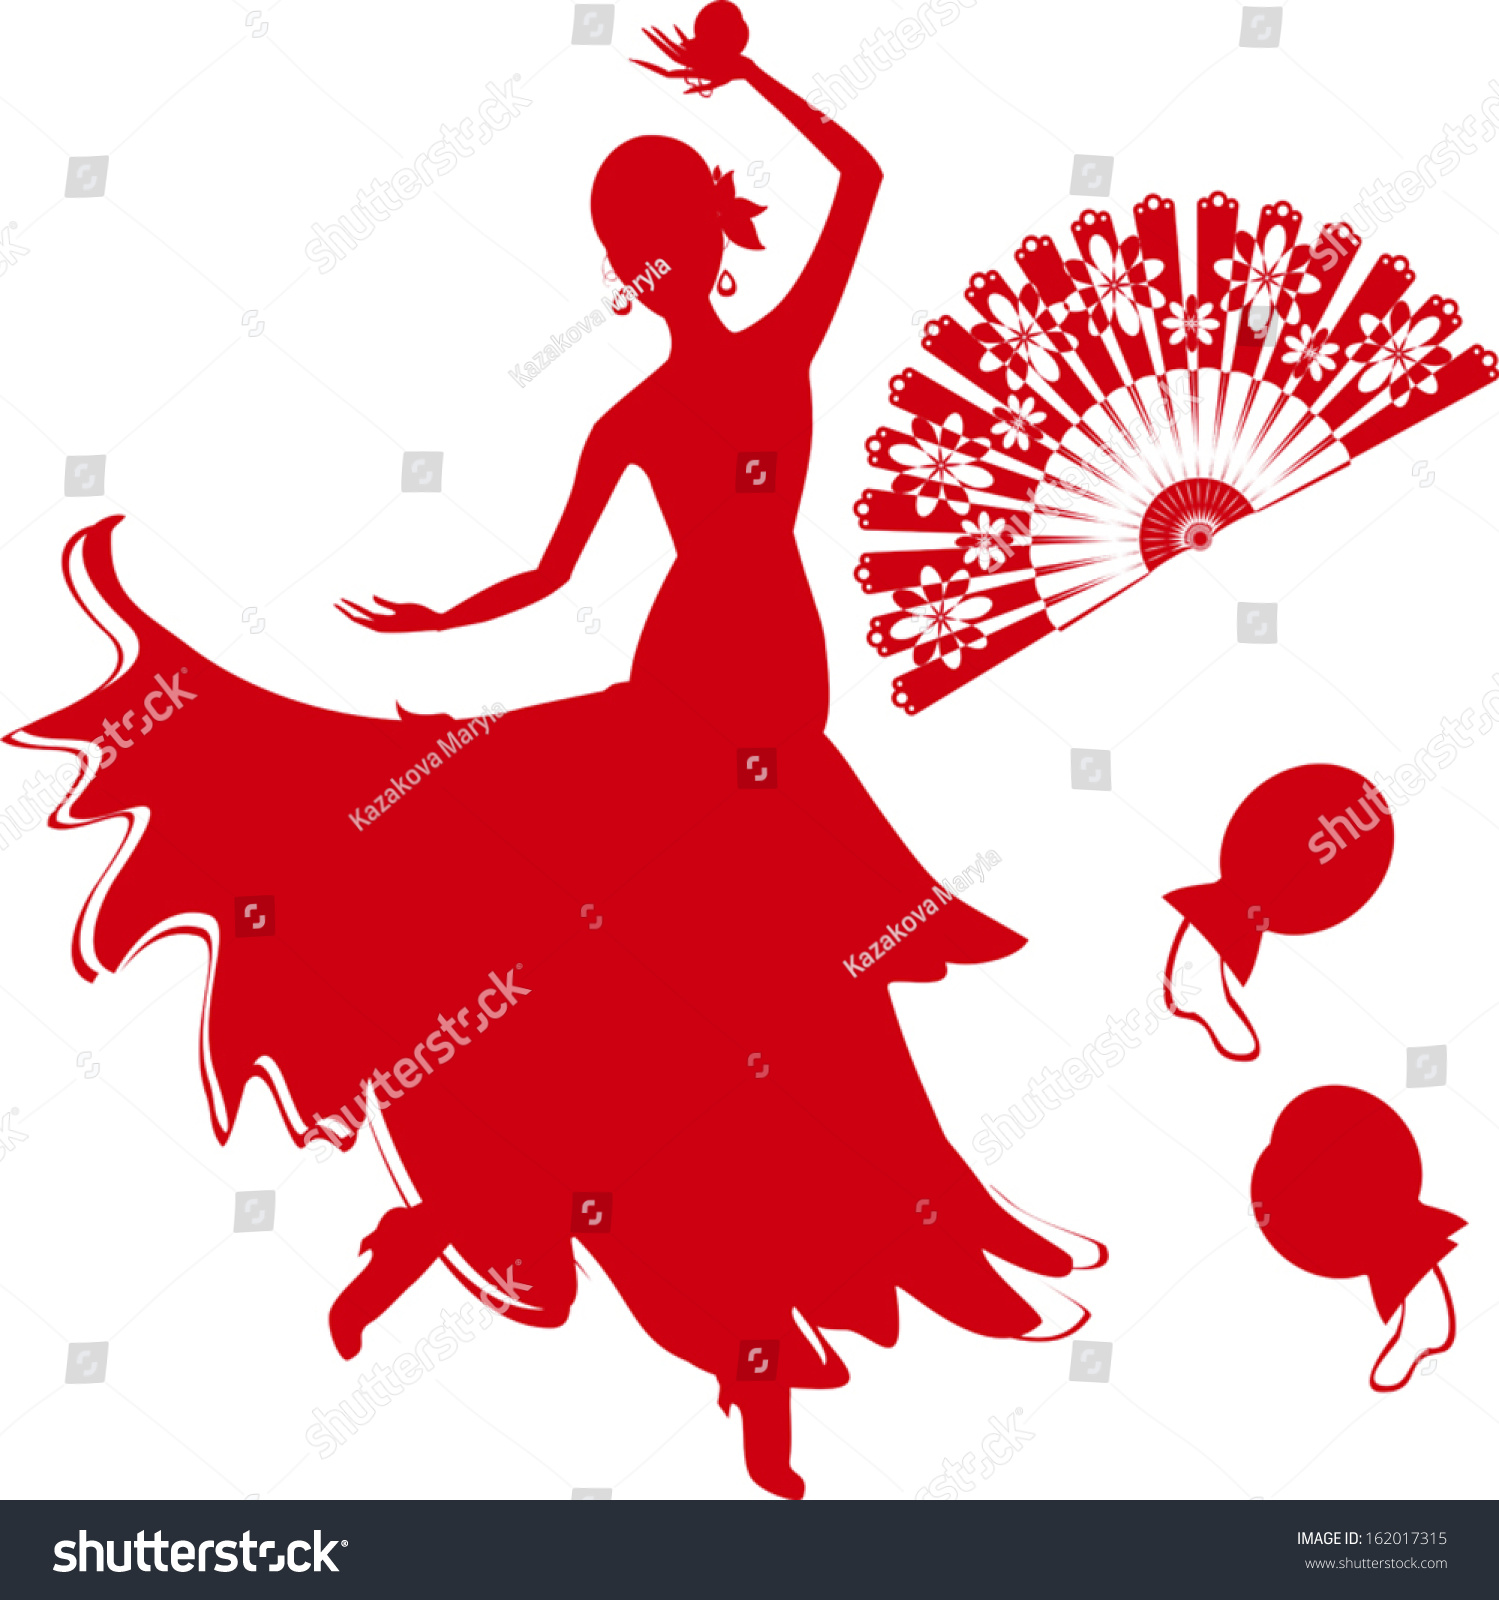 silhouette flamenco dancer fan castanets stock vector 162017315